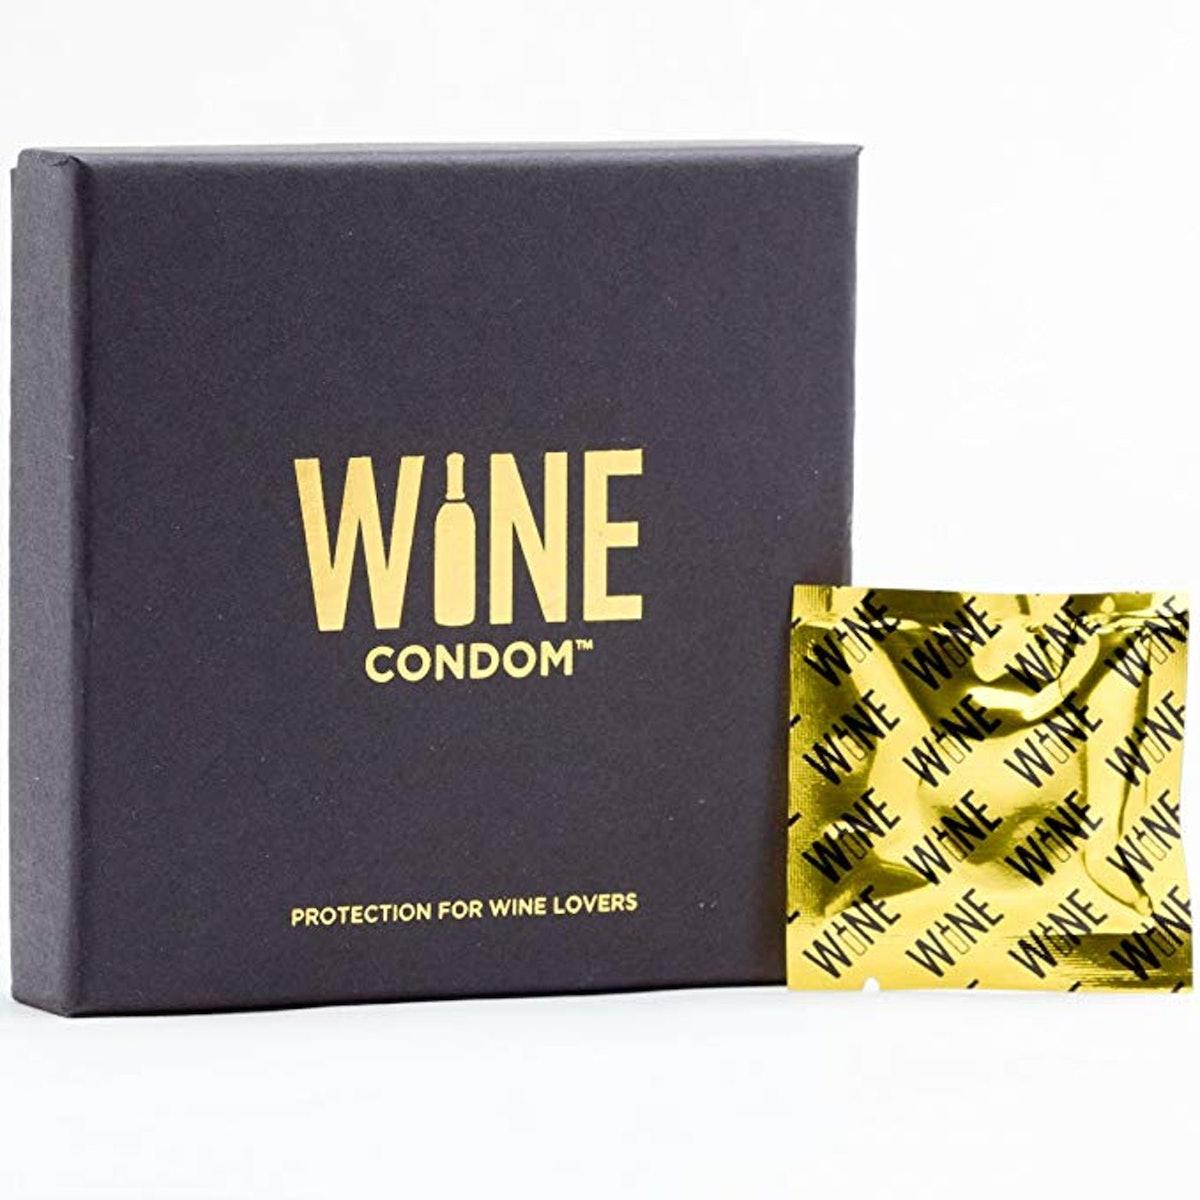 Wine Condom Wine & Beverage Bottle Stopper